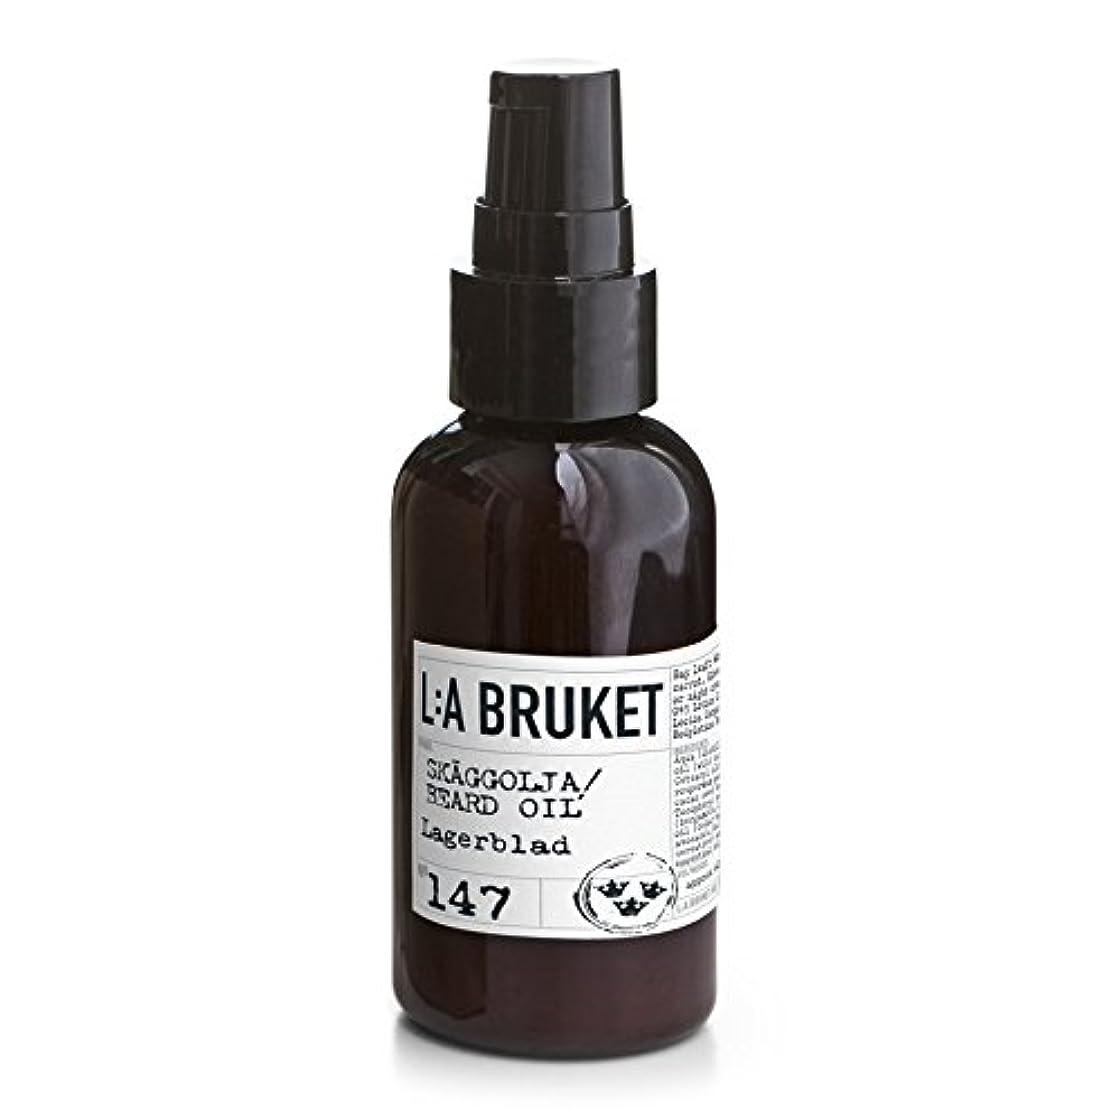 L:A Bruket Laurel Leaf Beard Oil 200ml - :月桂樹の葉のひげオイル200ミリリットル [並行輸入品]